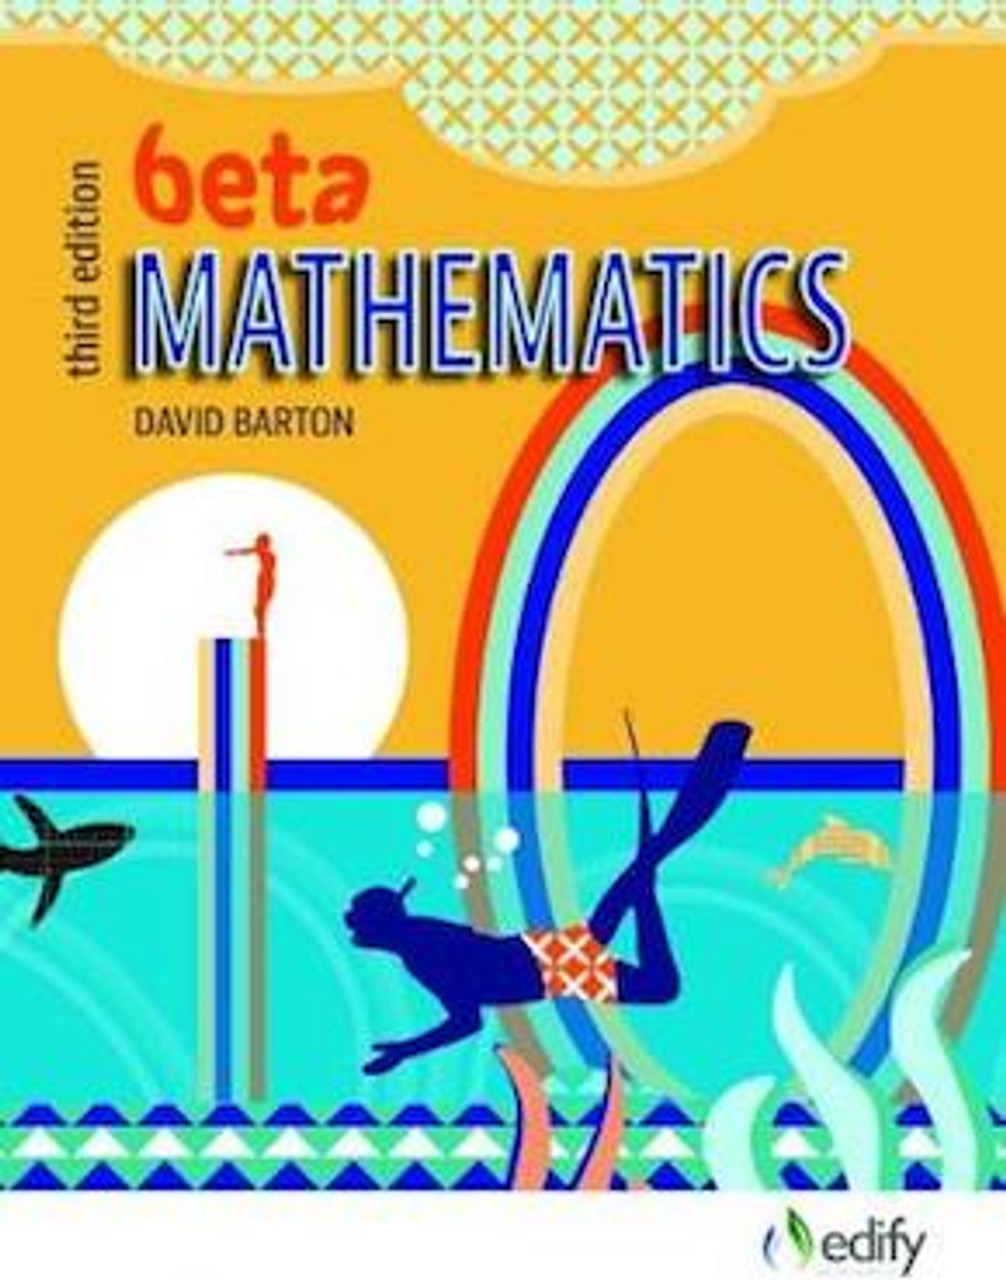 Beta maths homework book sample resume of a college graduate